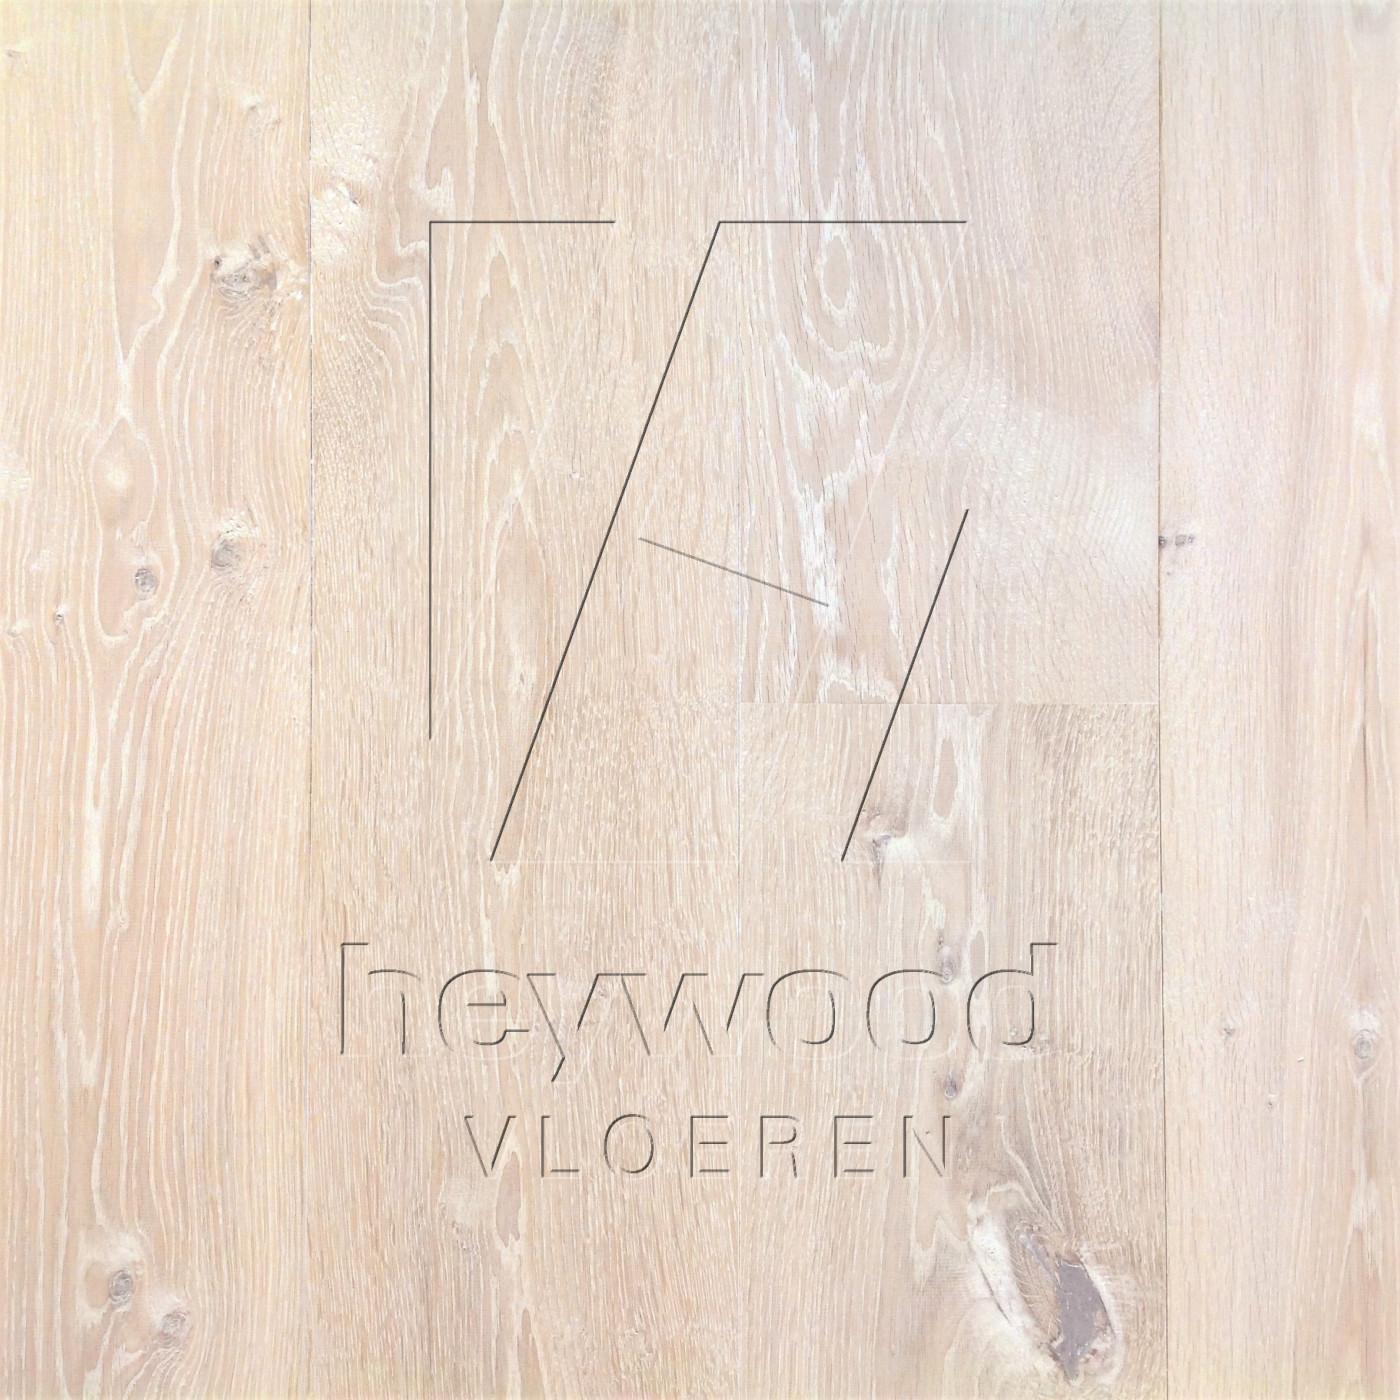 Plank Vancouver in European Oak Character of Bespoke Wooden Floors